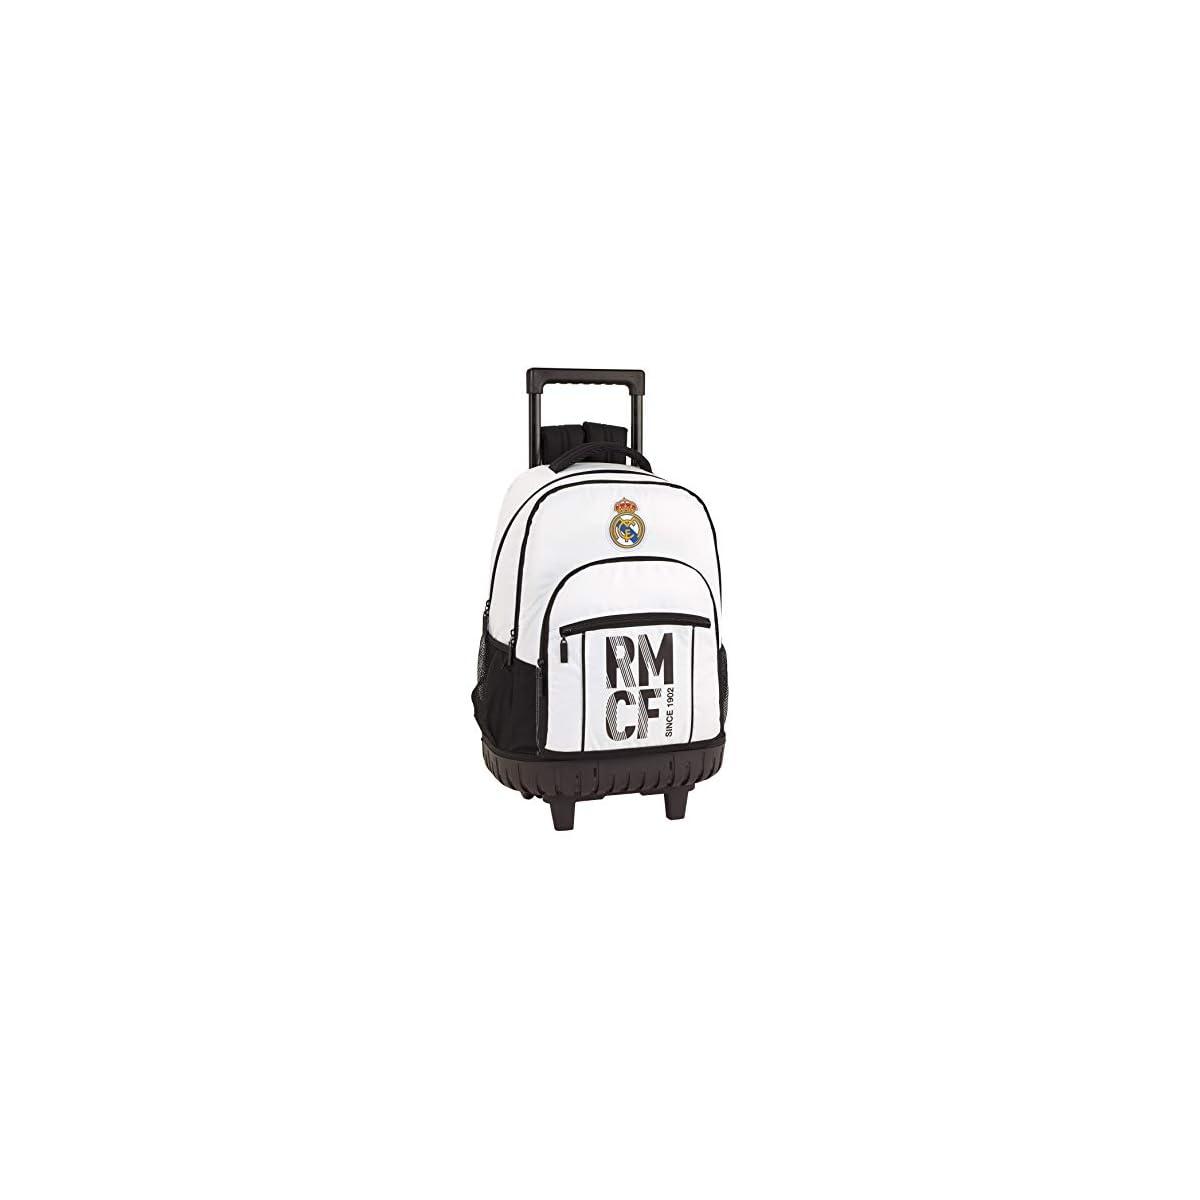 Drayton RF601 Digistat Plus Rf Habitaci/ón Wireless Termostato